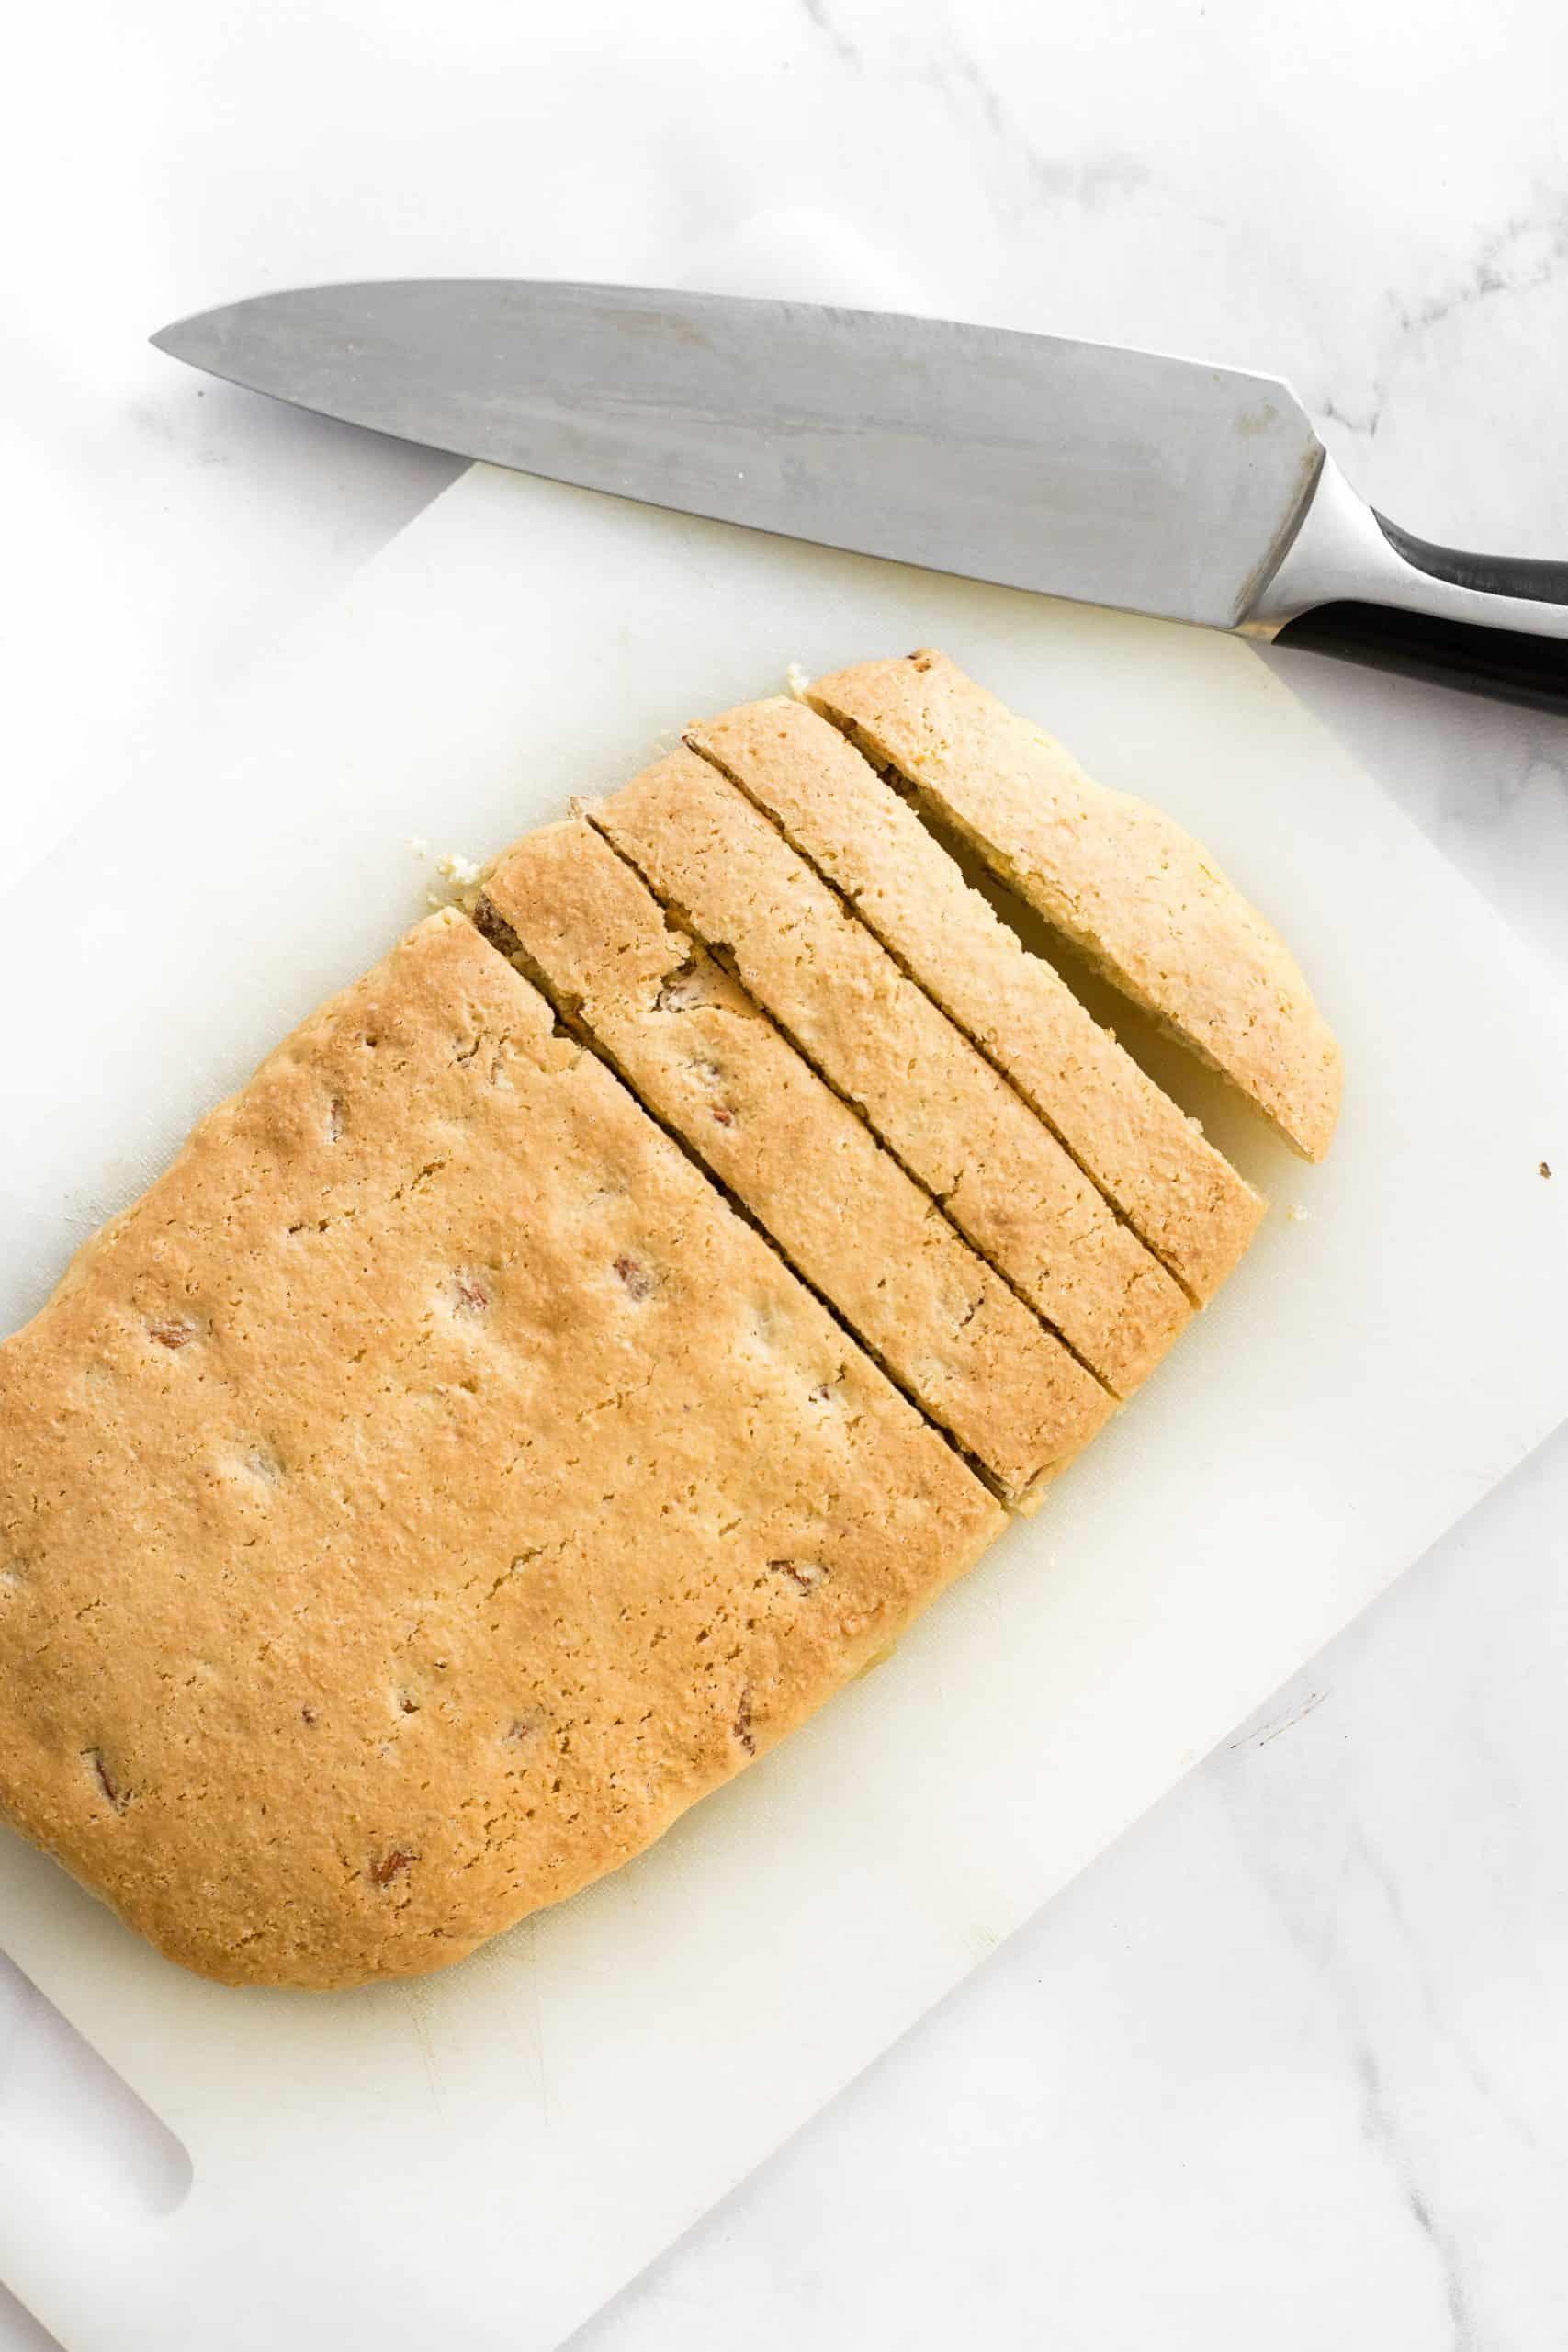 Sliced log of dough on a chopping board.